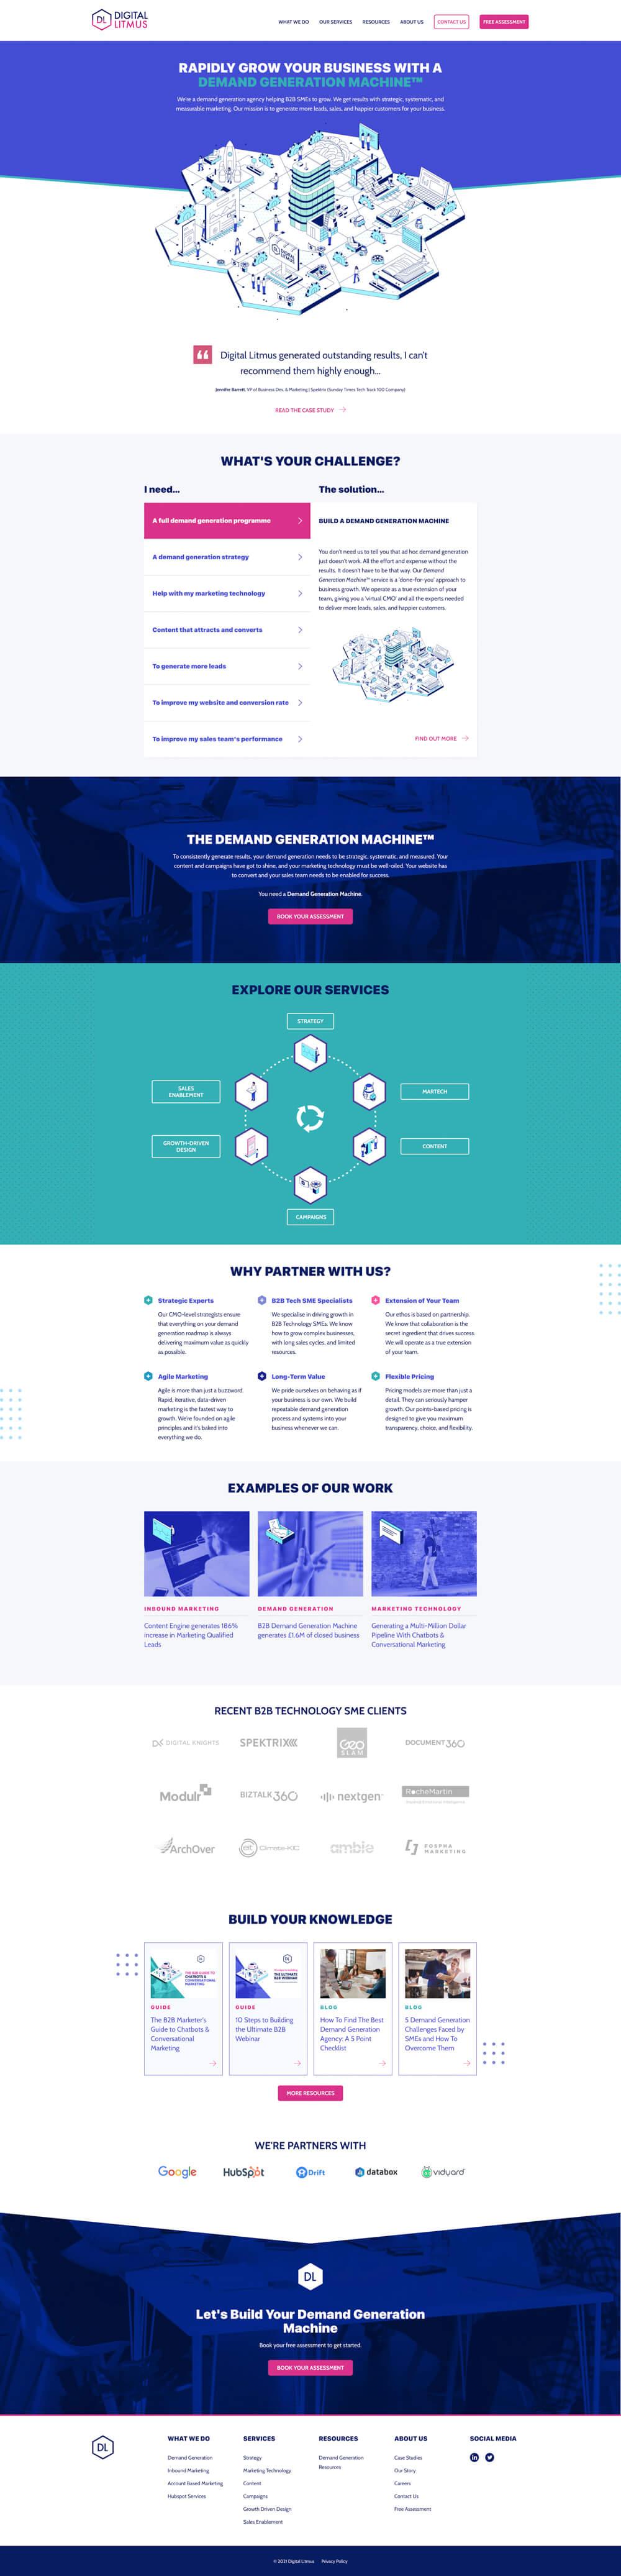 Homepage | Digital Litmus Ltd. - Screenshot